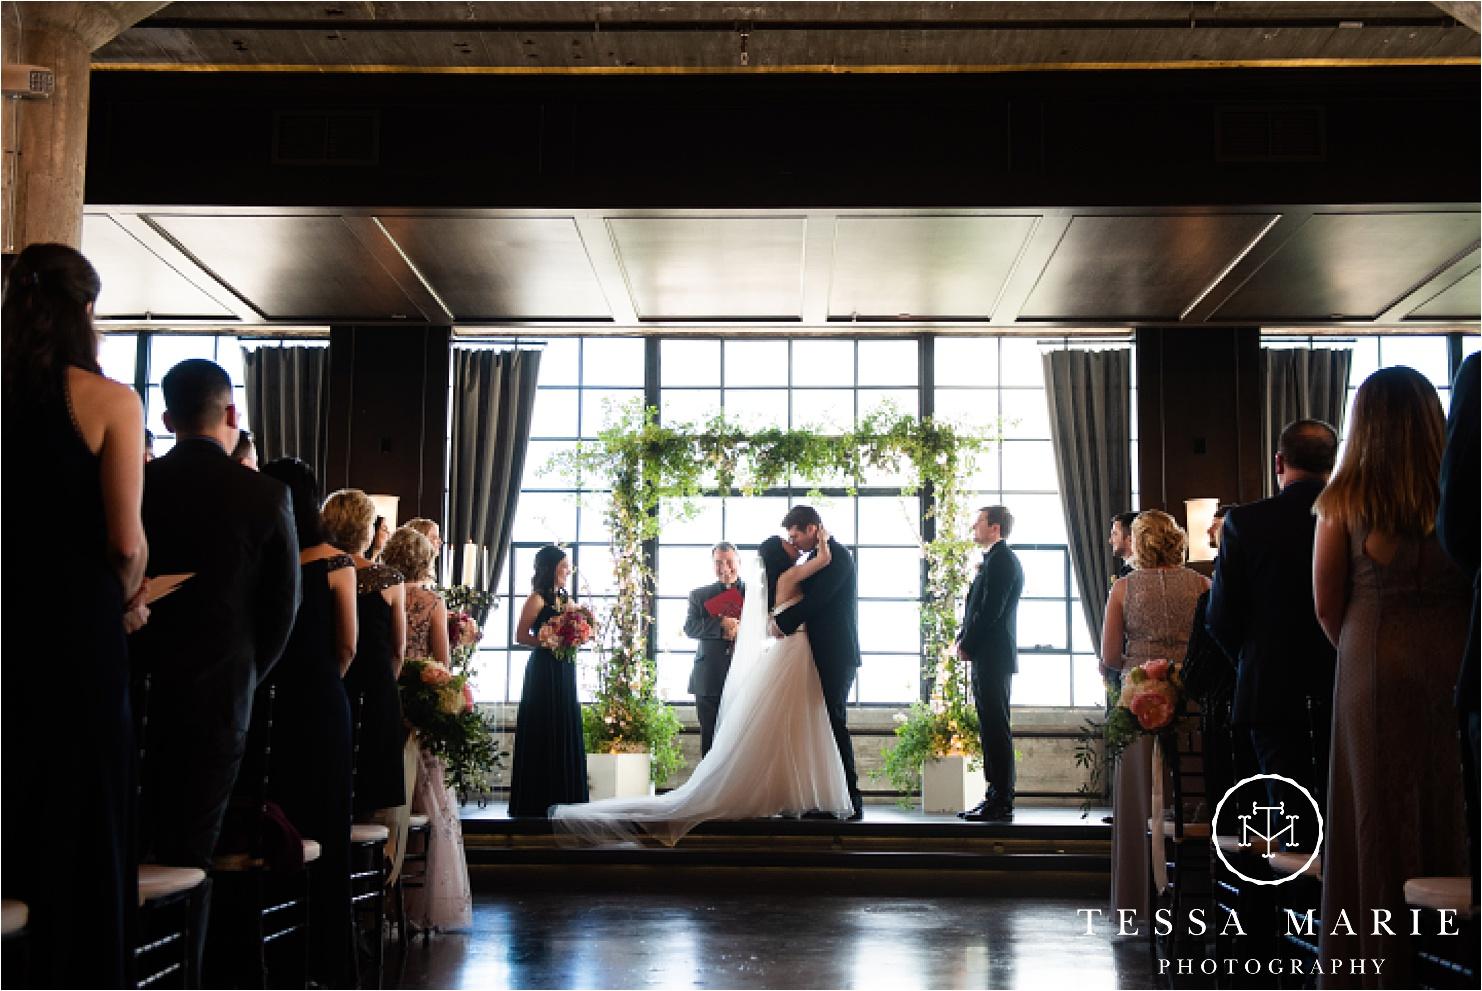 Tessa_marie_weddings_houston_wedding_photographer_The_astorian_0122.jpg